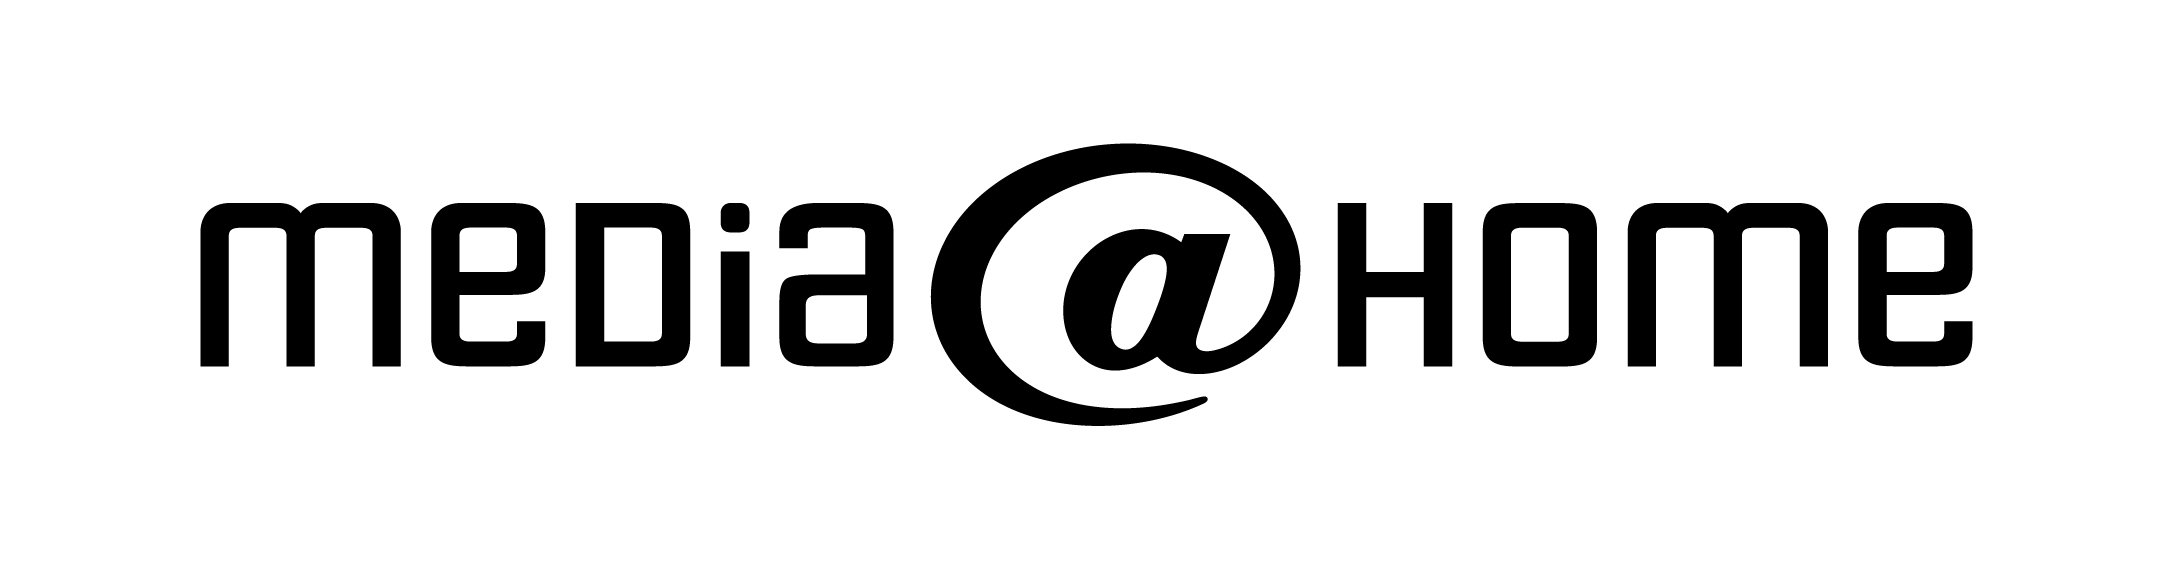 mah_logo_schwarz.jpg